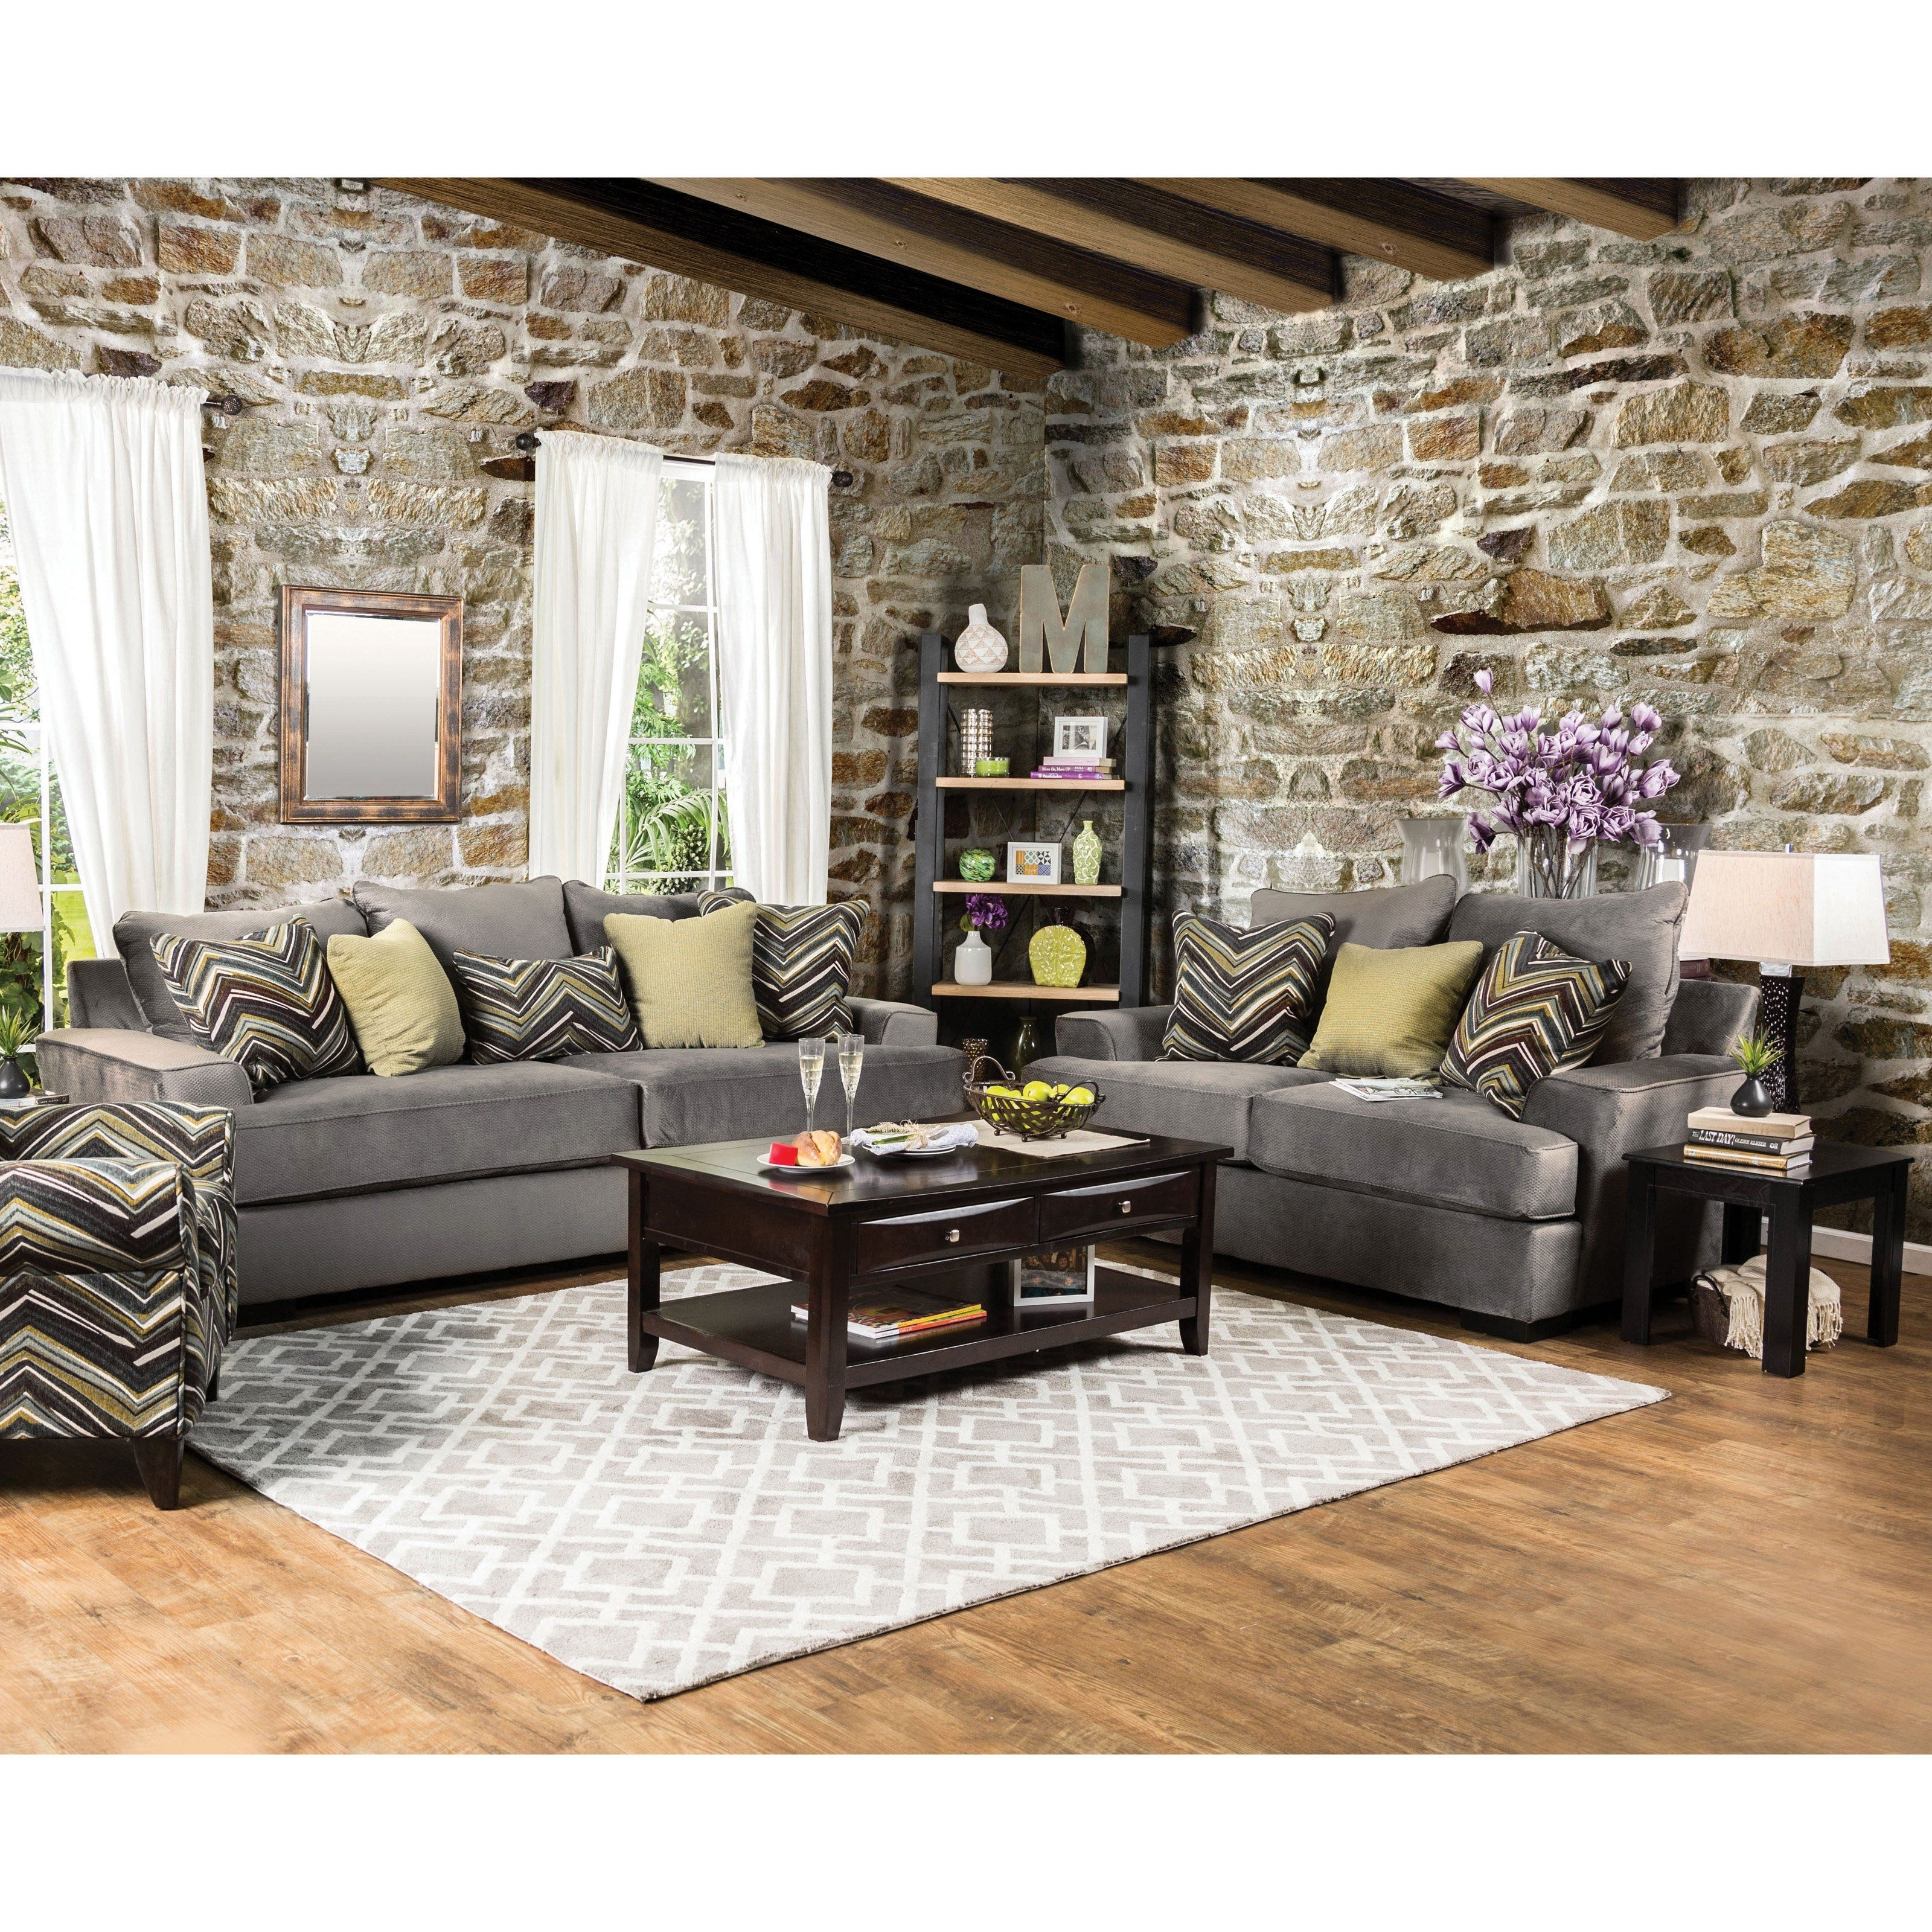 Furniture Of America Marius Simple Living 2 Piece Sofa Set – Idf Throughout Marius Dark Grey 3 Piece Sectionals (View 18 of 25)